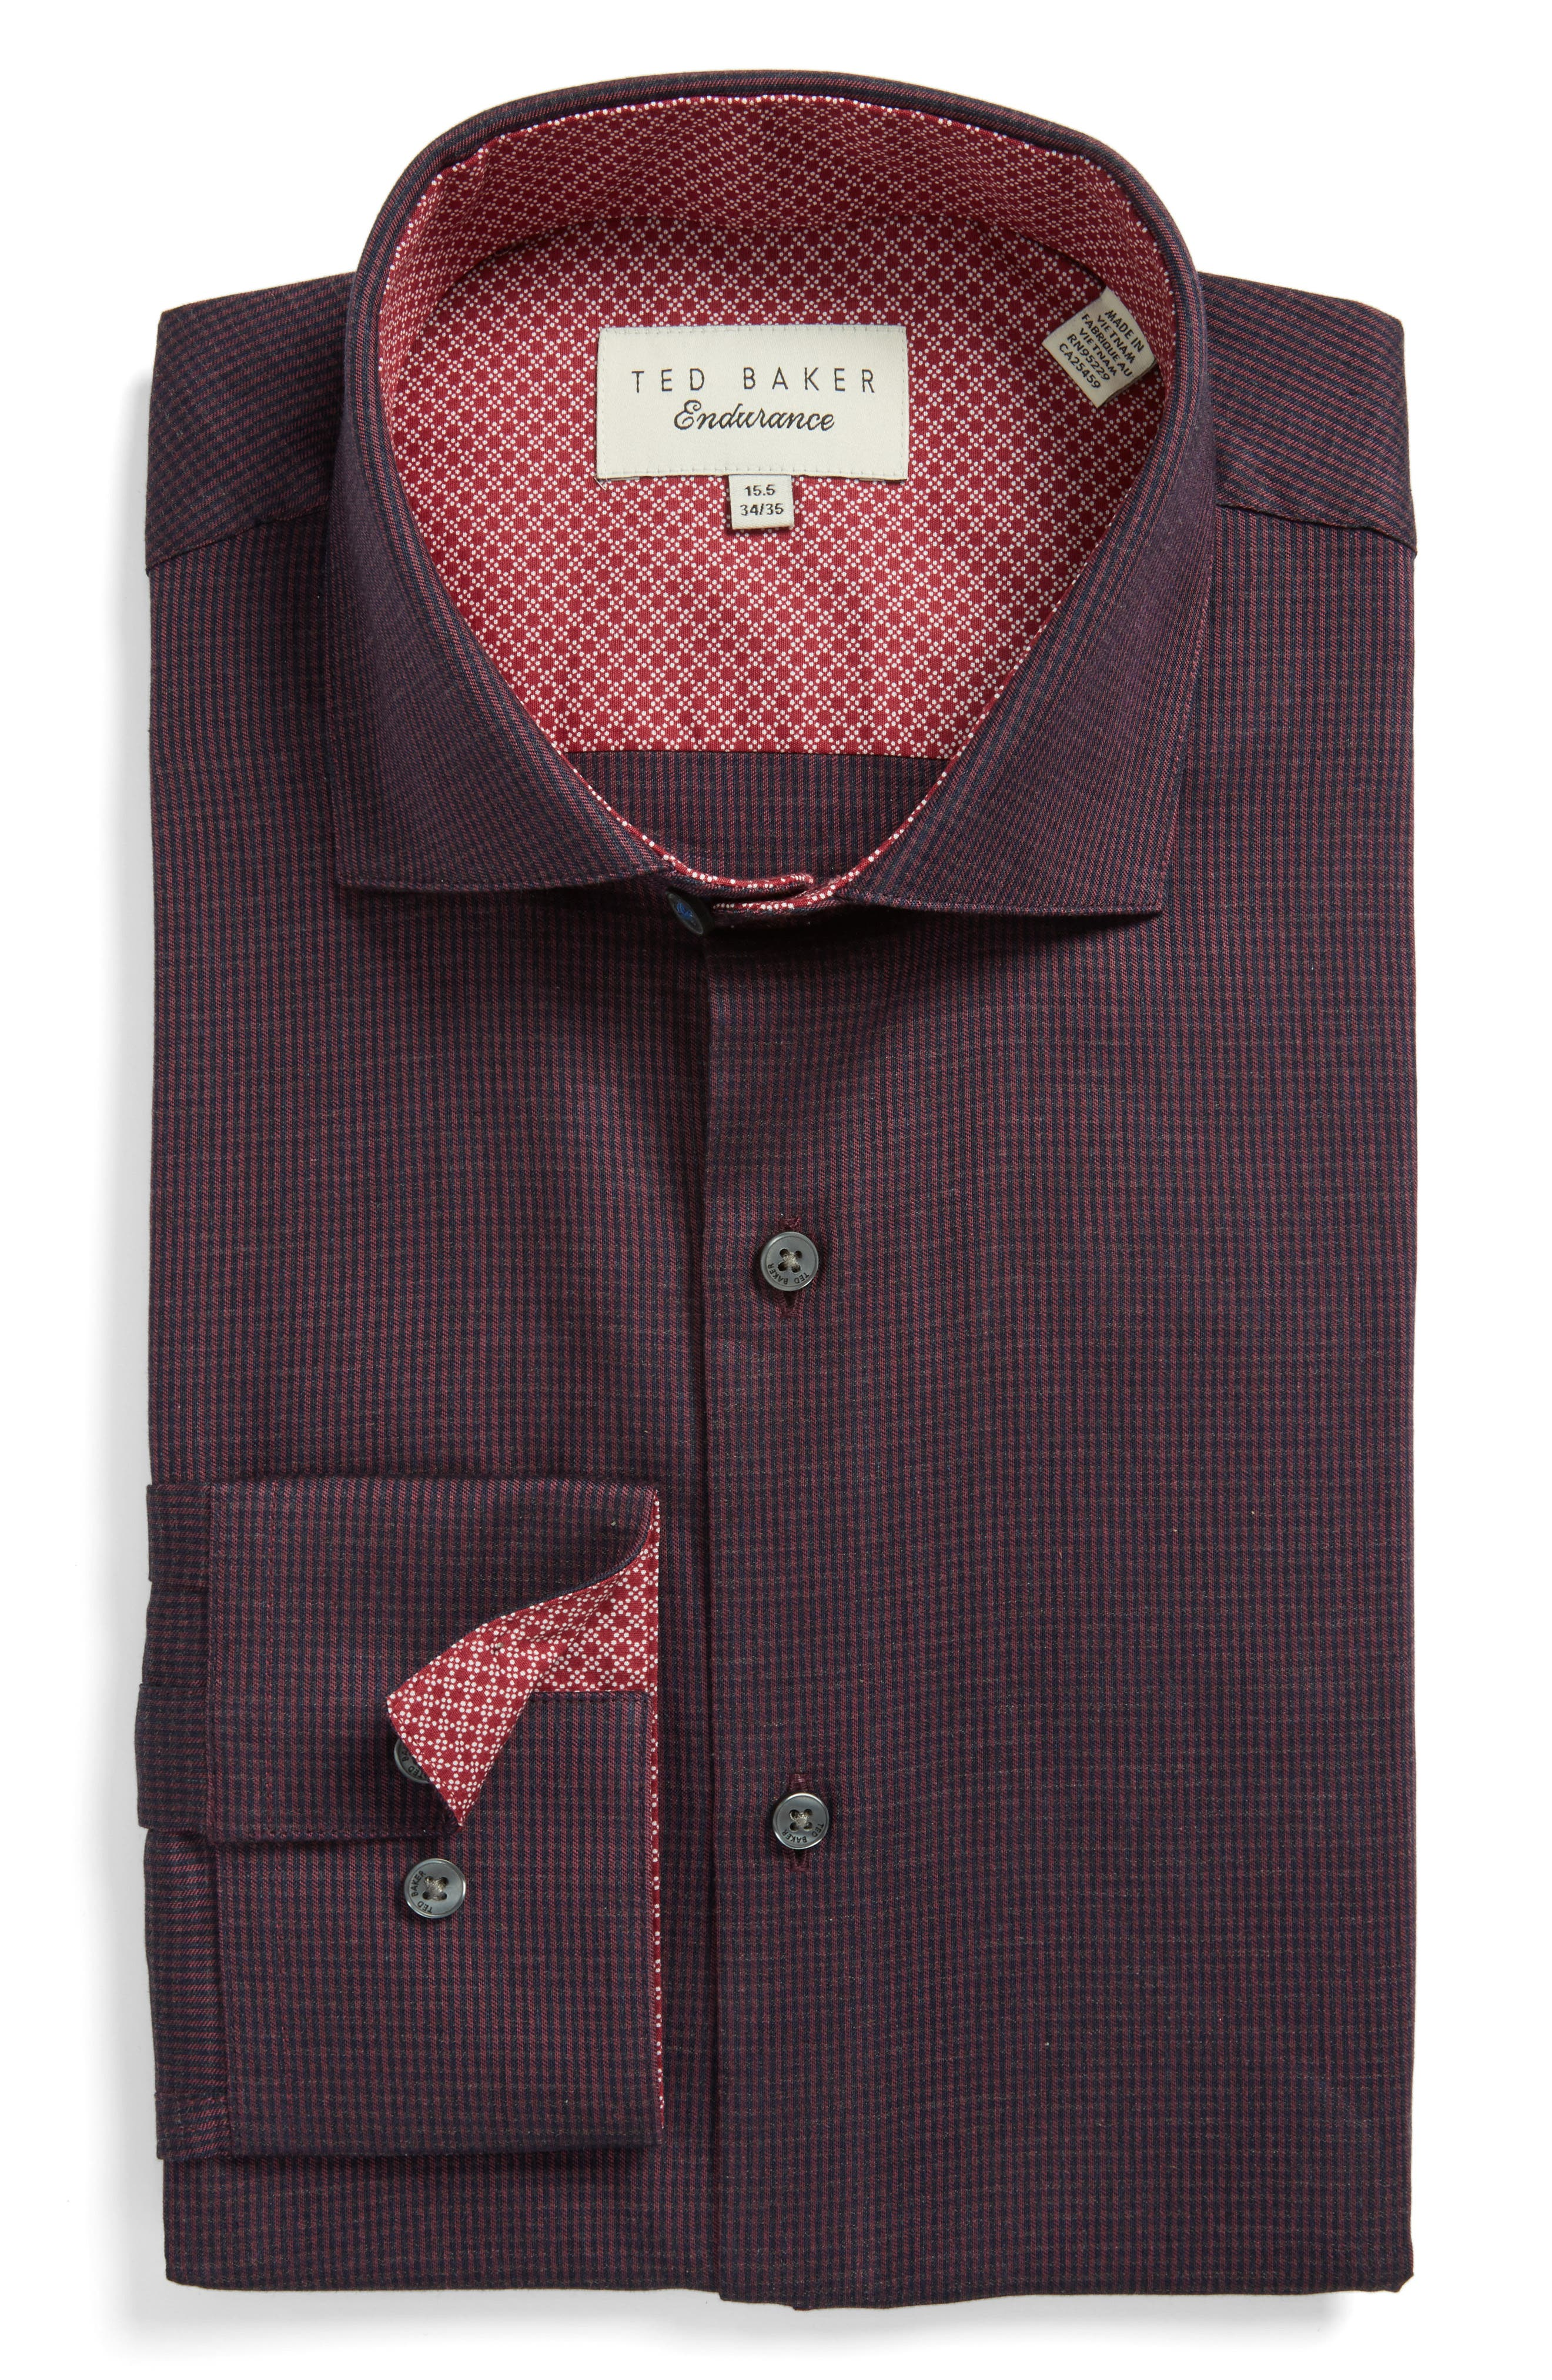 Main Image - Ted Baker London Endurance Trim Fit Pattern Dress Shirt